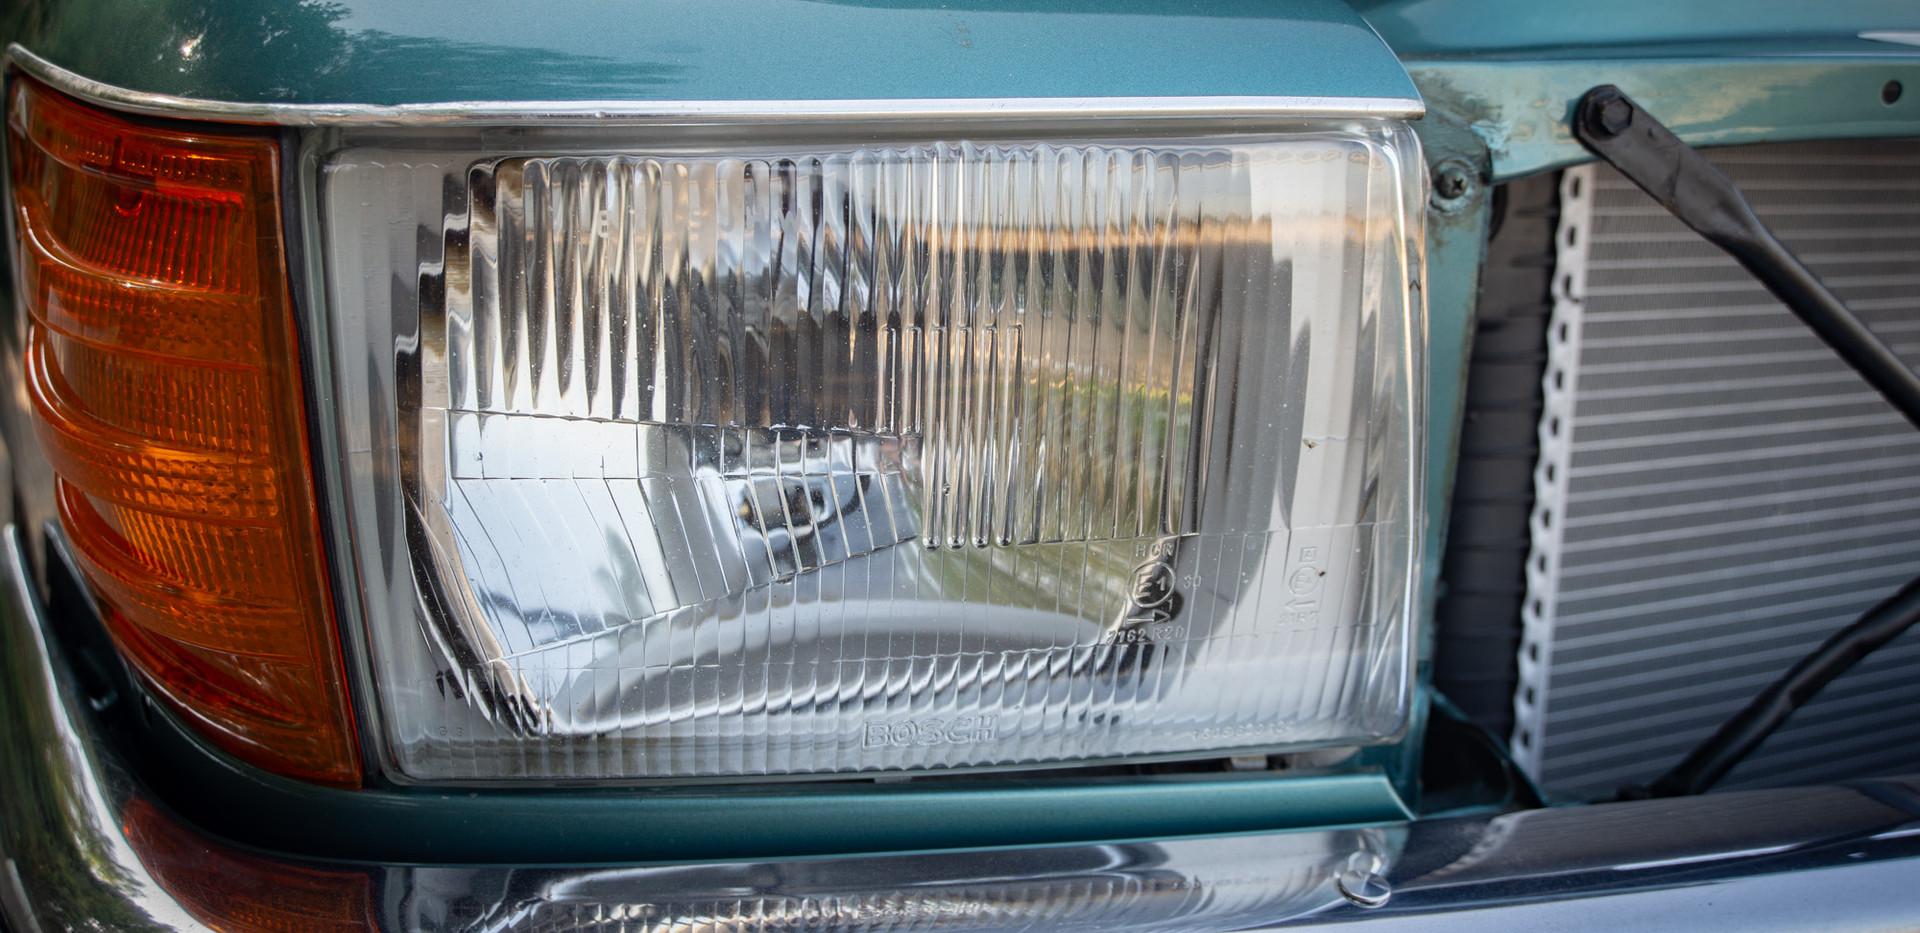 R107 300SL - Uk for sale london-46.jpg